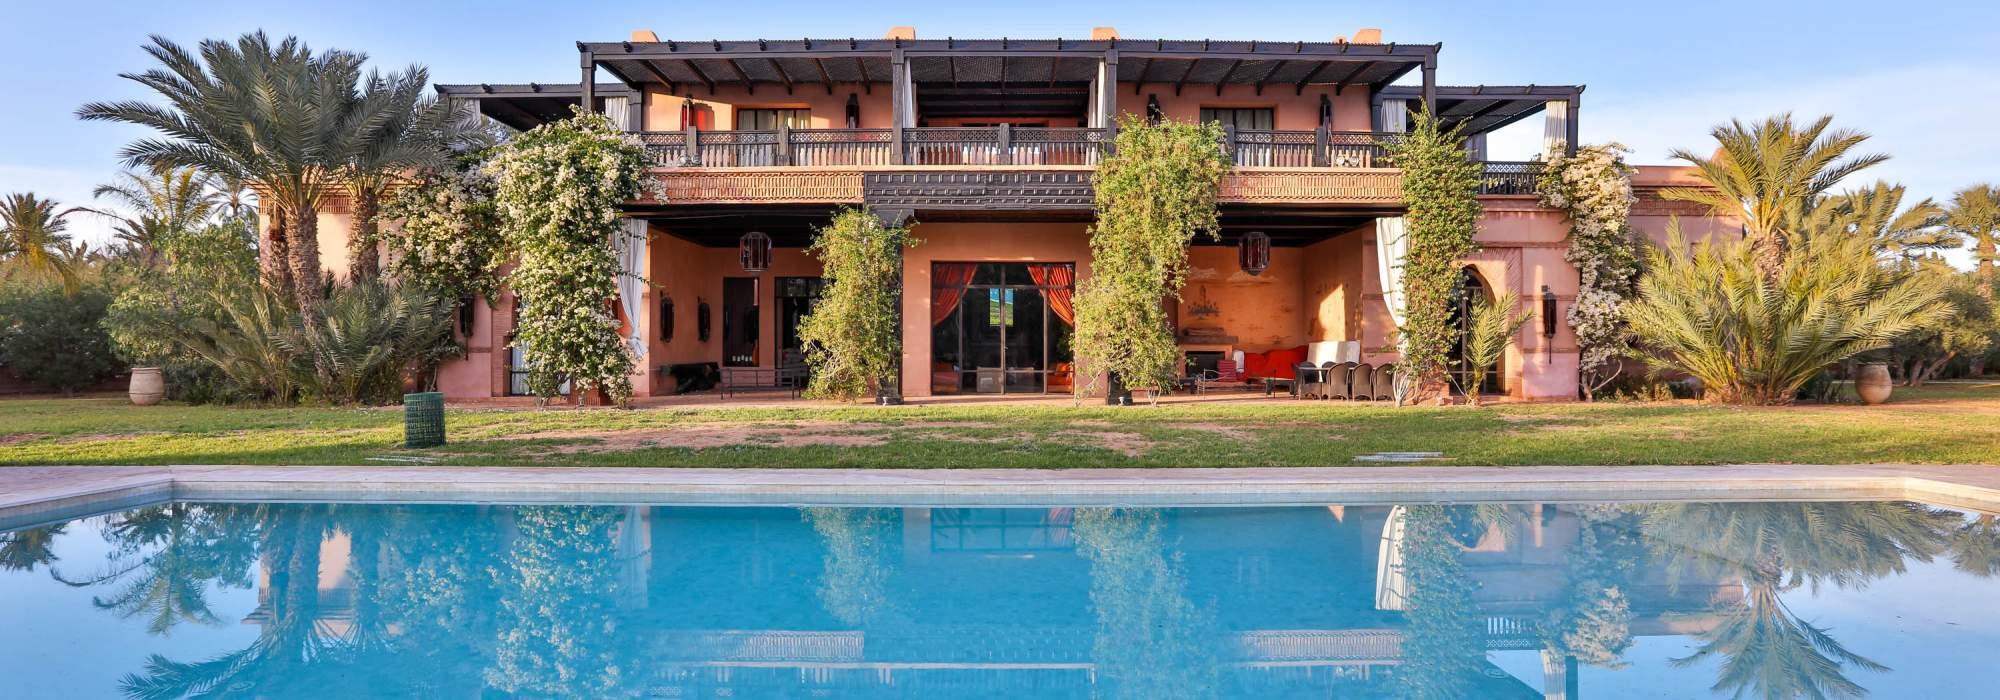 villa de prestige a vendre palmeraie marrakech